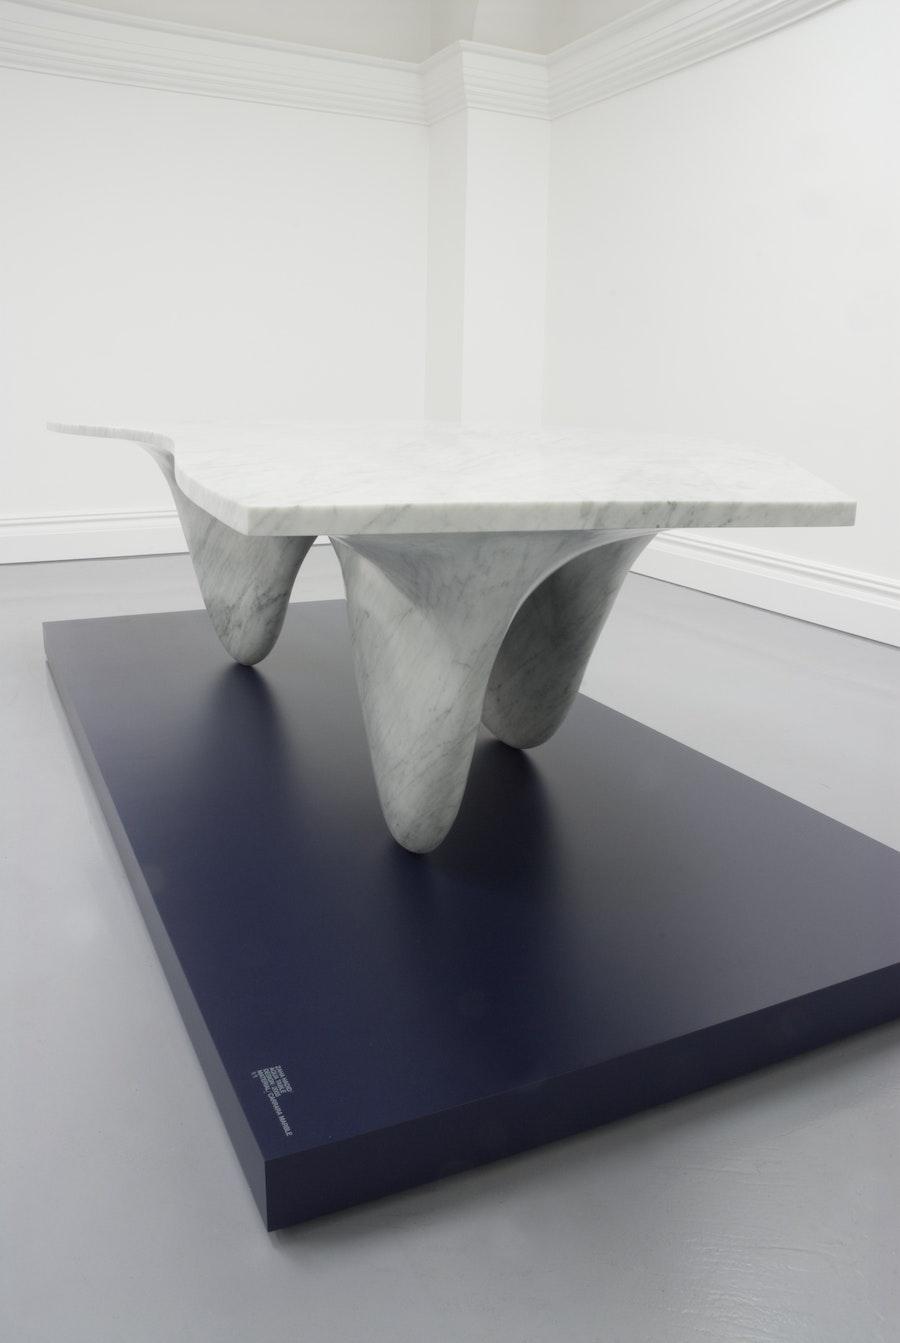 Zaha Hadid AQUA TABLE Carrara Marble Limited Edition 1 of 1 c2007 Establishedand Sons c O Flaherty All Rights Reserved exhibition 04 300dpi